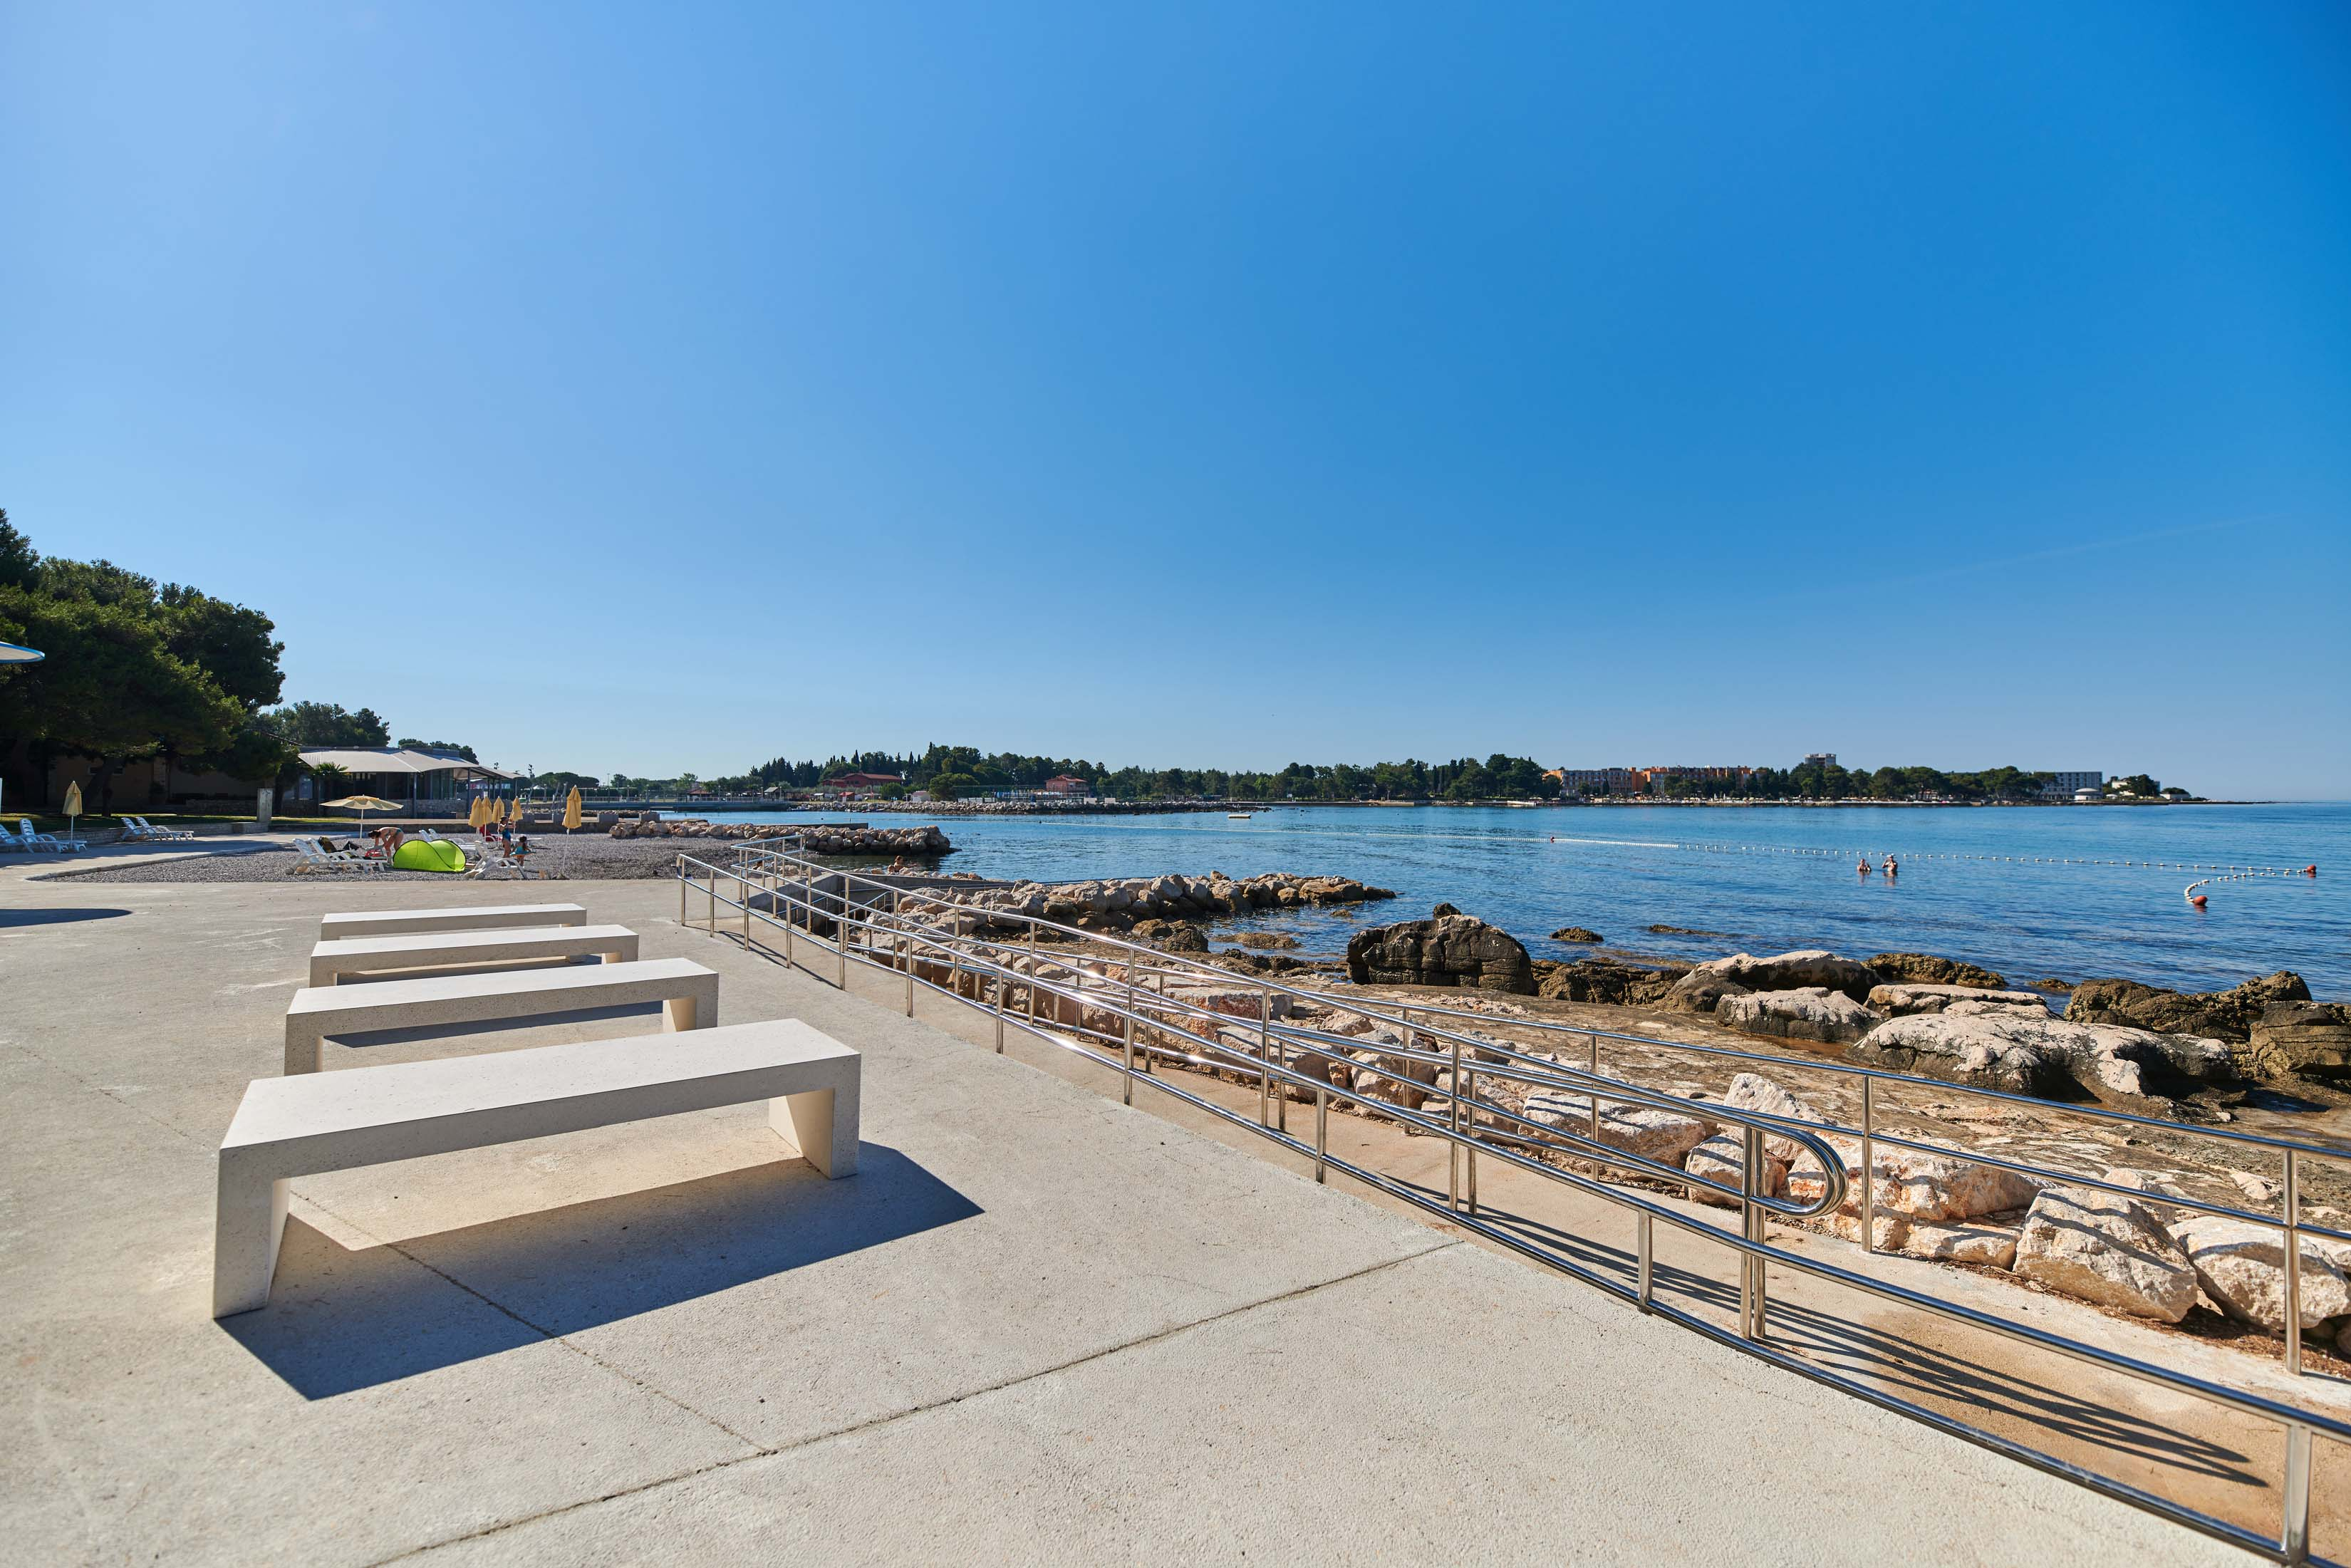 https://cms.satur.sk/data/imgs/tour_image/orig/stella_maris_resort_plava_laguna_2020_villas_beach_-35-1800587.jpg